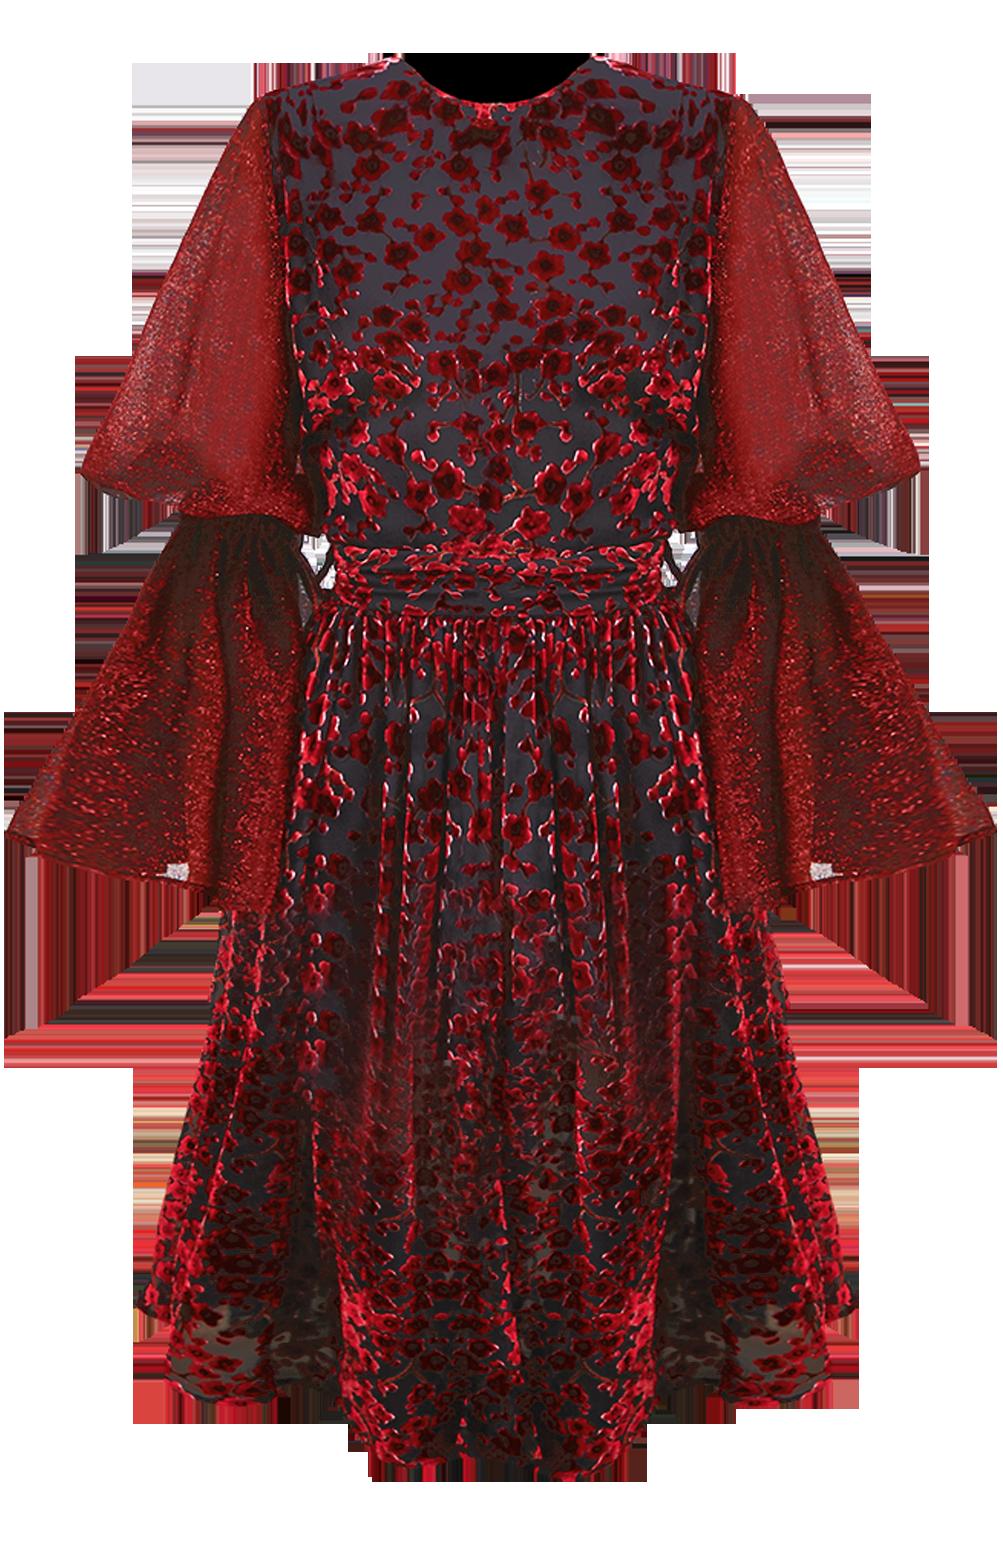 Scarlet Mini Dress by Georgia Hardinge on curated-crowd.com